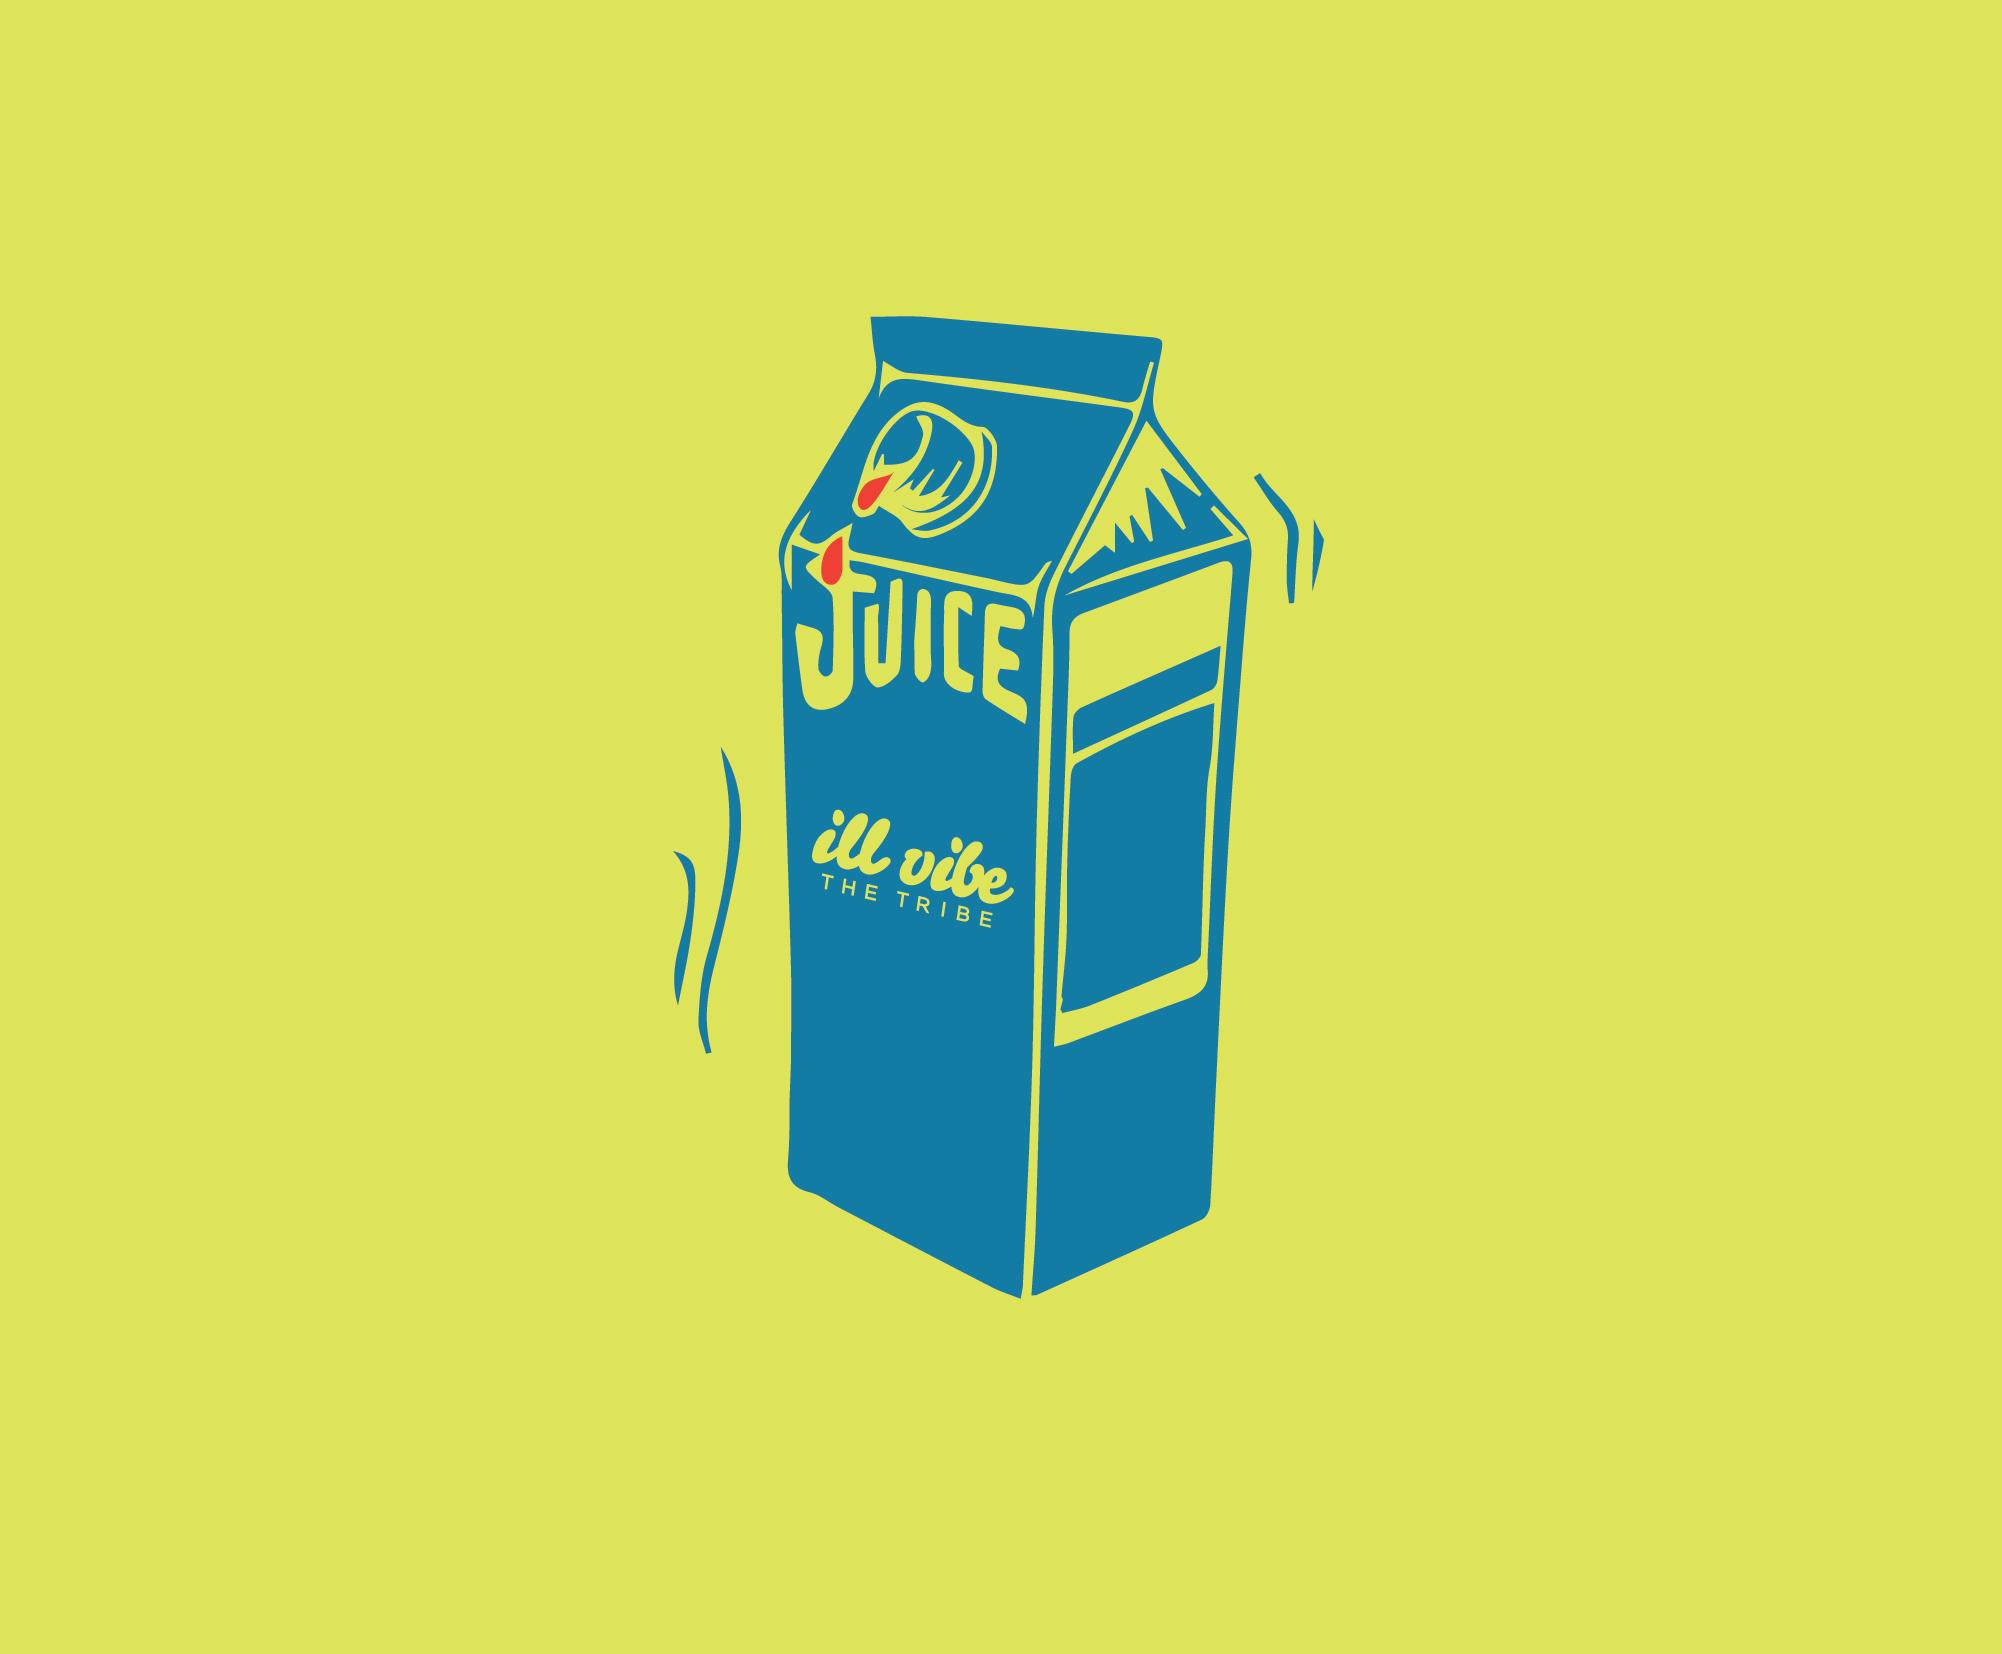 The Juice